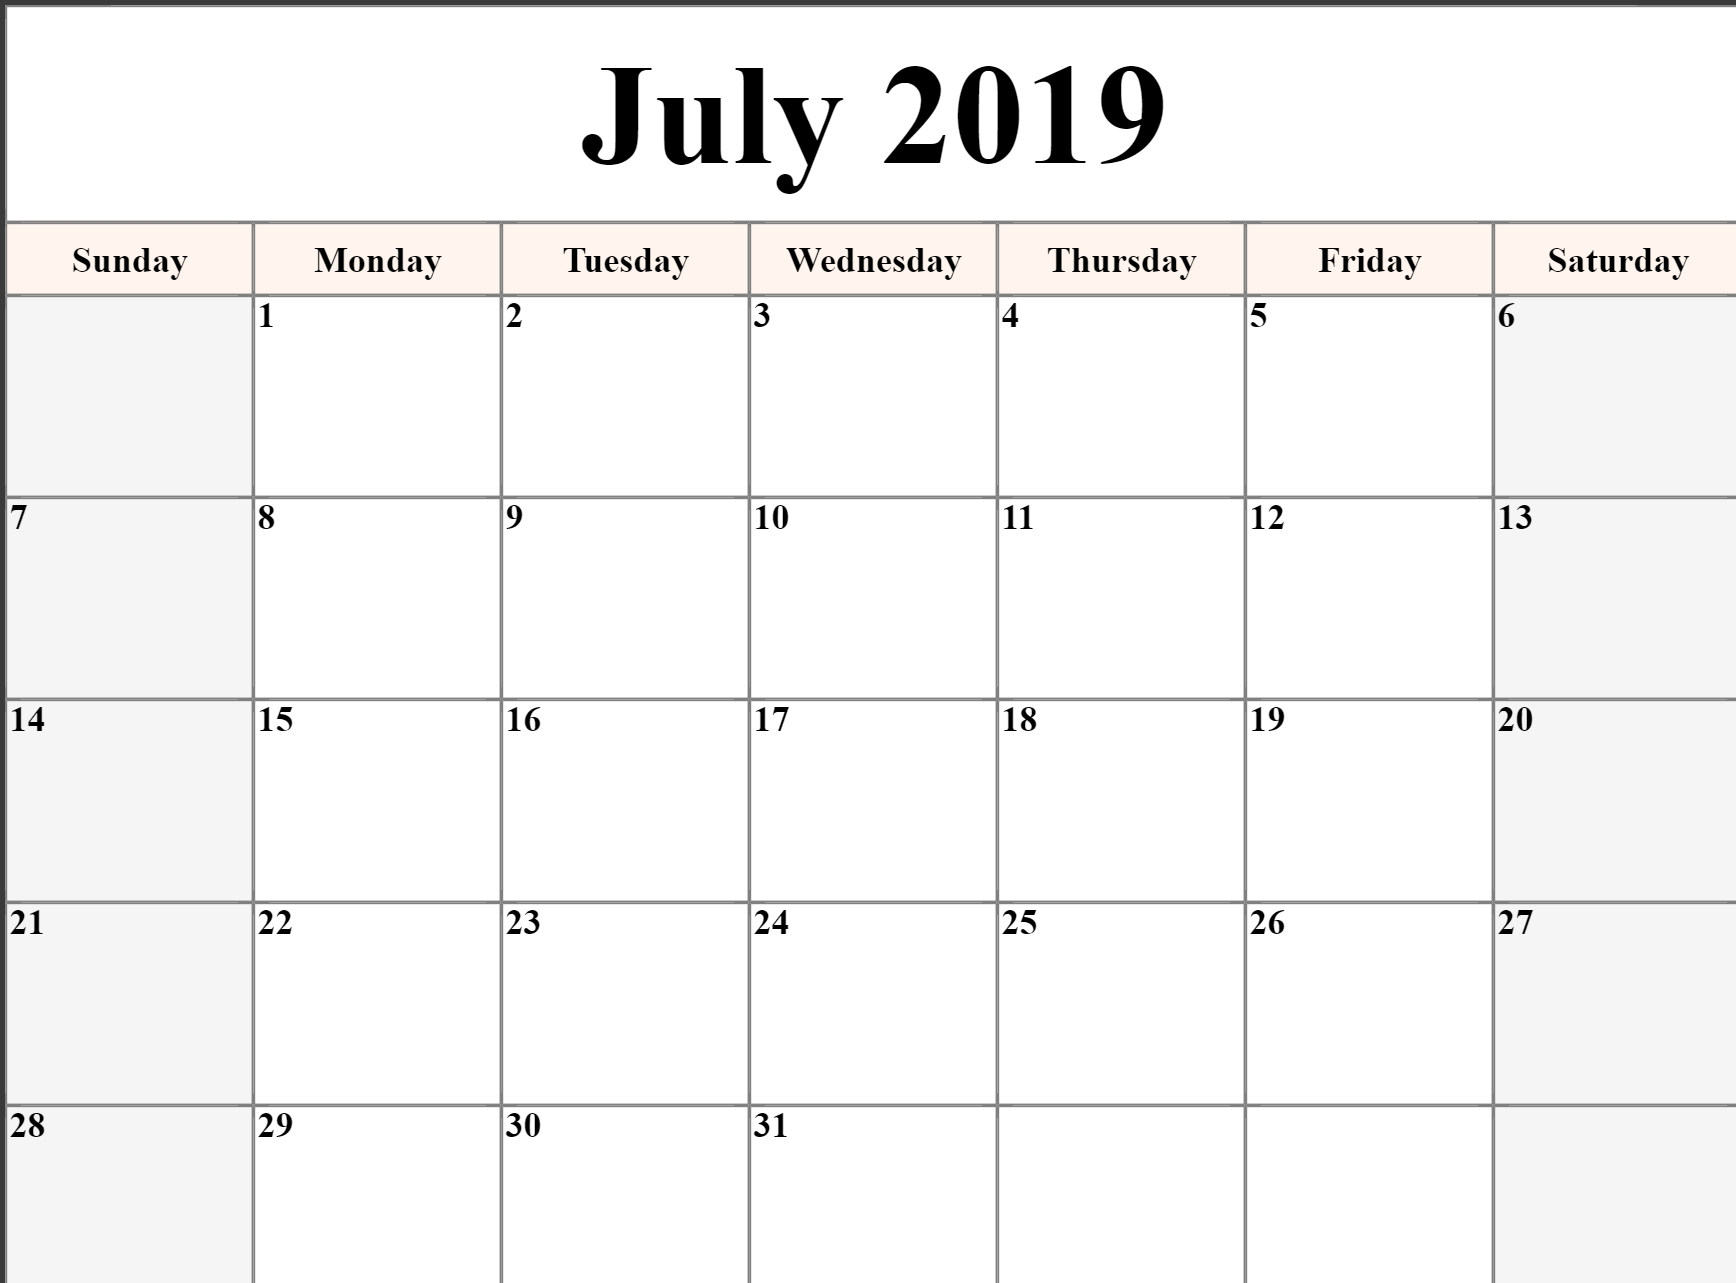 Free Printable July 2019 Blank Calendar Desk   Free Printable July inside Free Printable Calendars 2020 Waterproof